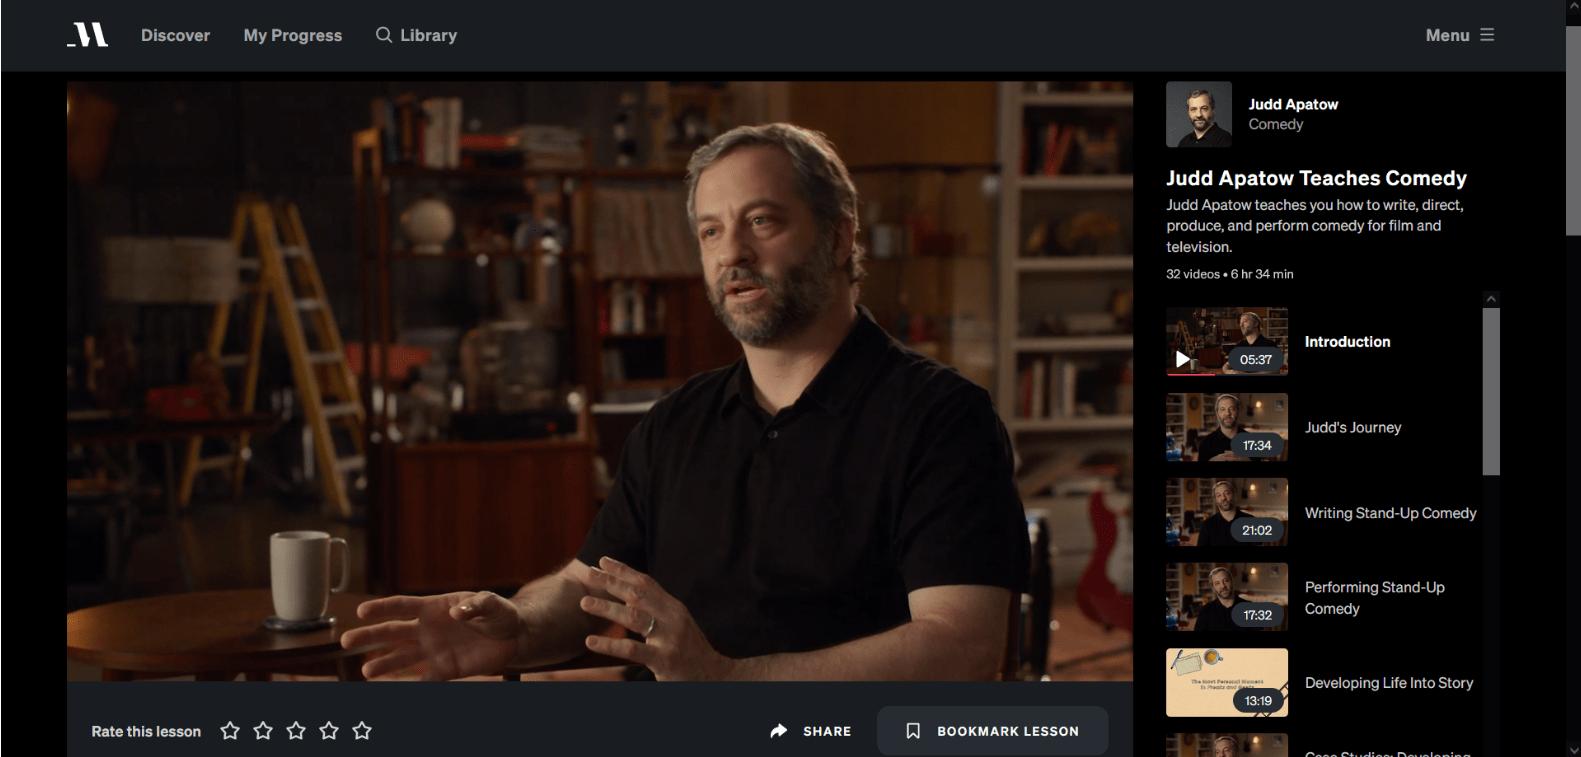 Judd apatow masterclass video